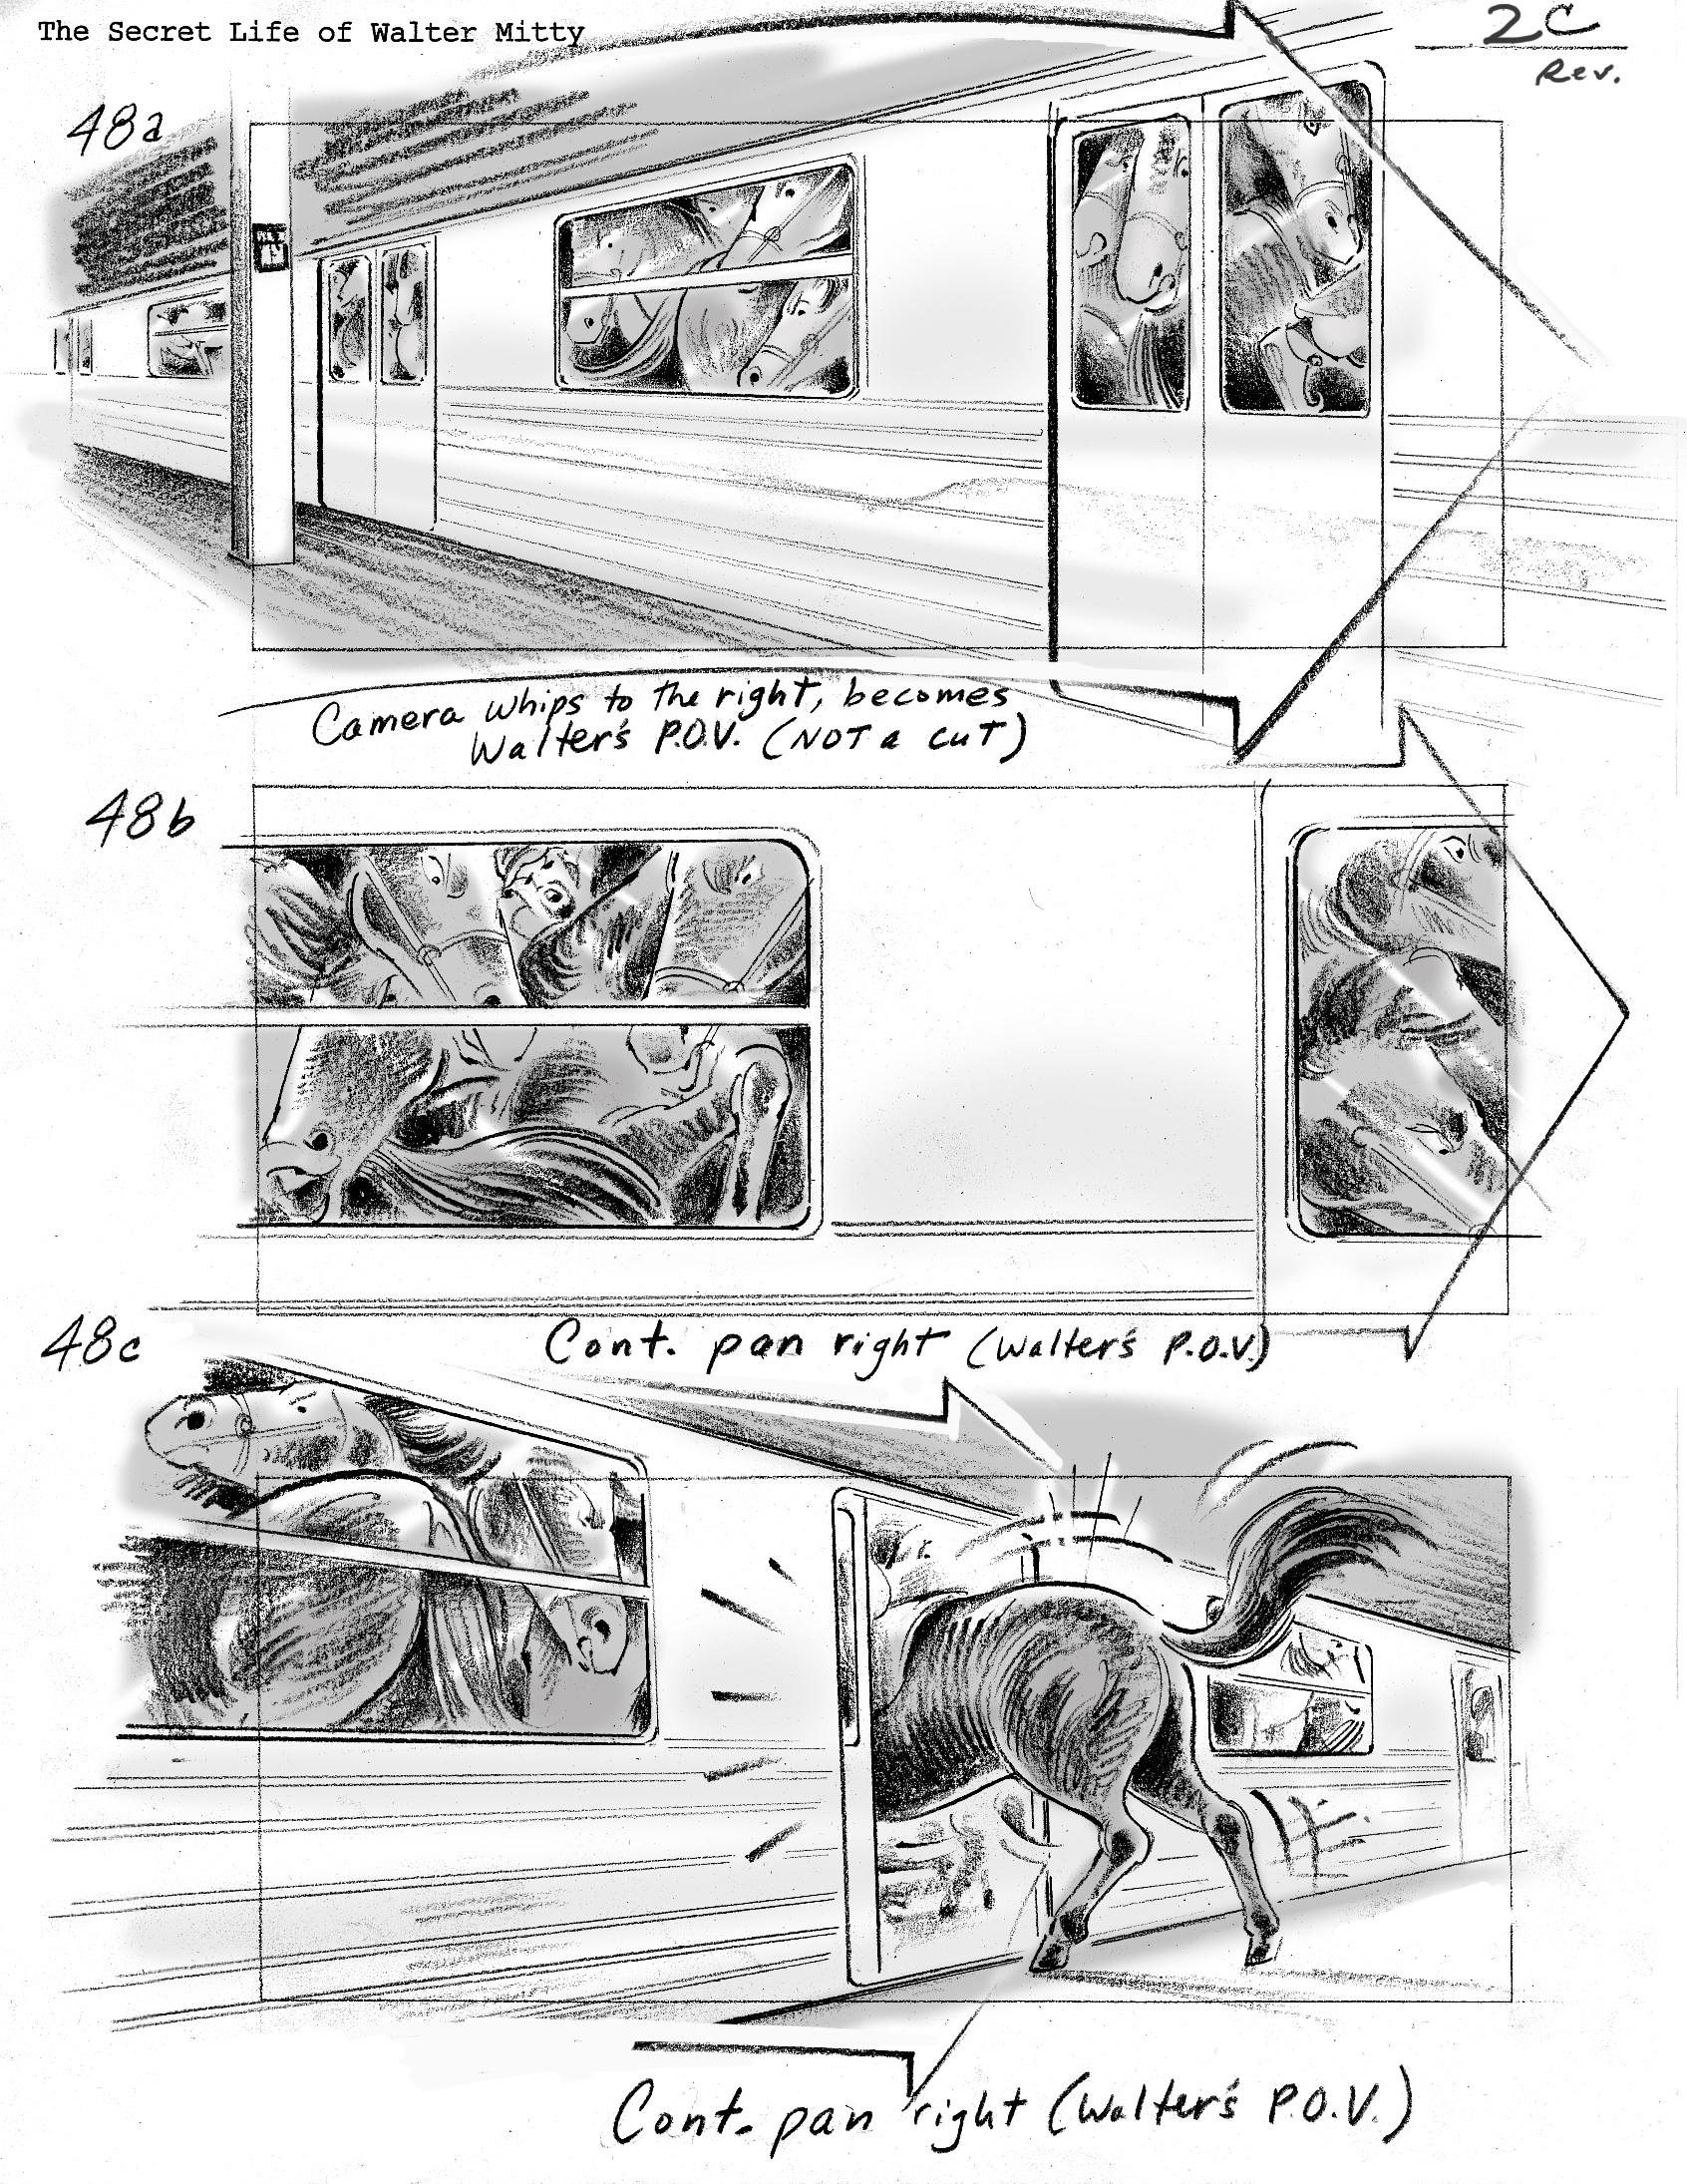 Secret Life of Walter Mitty 3.jpg